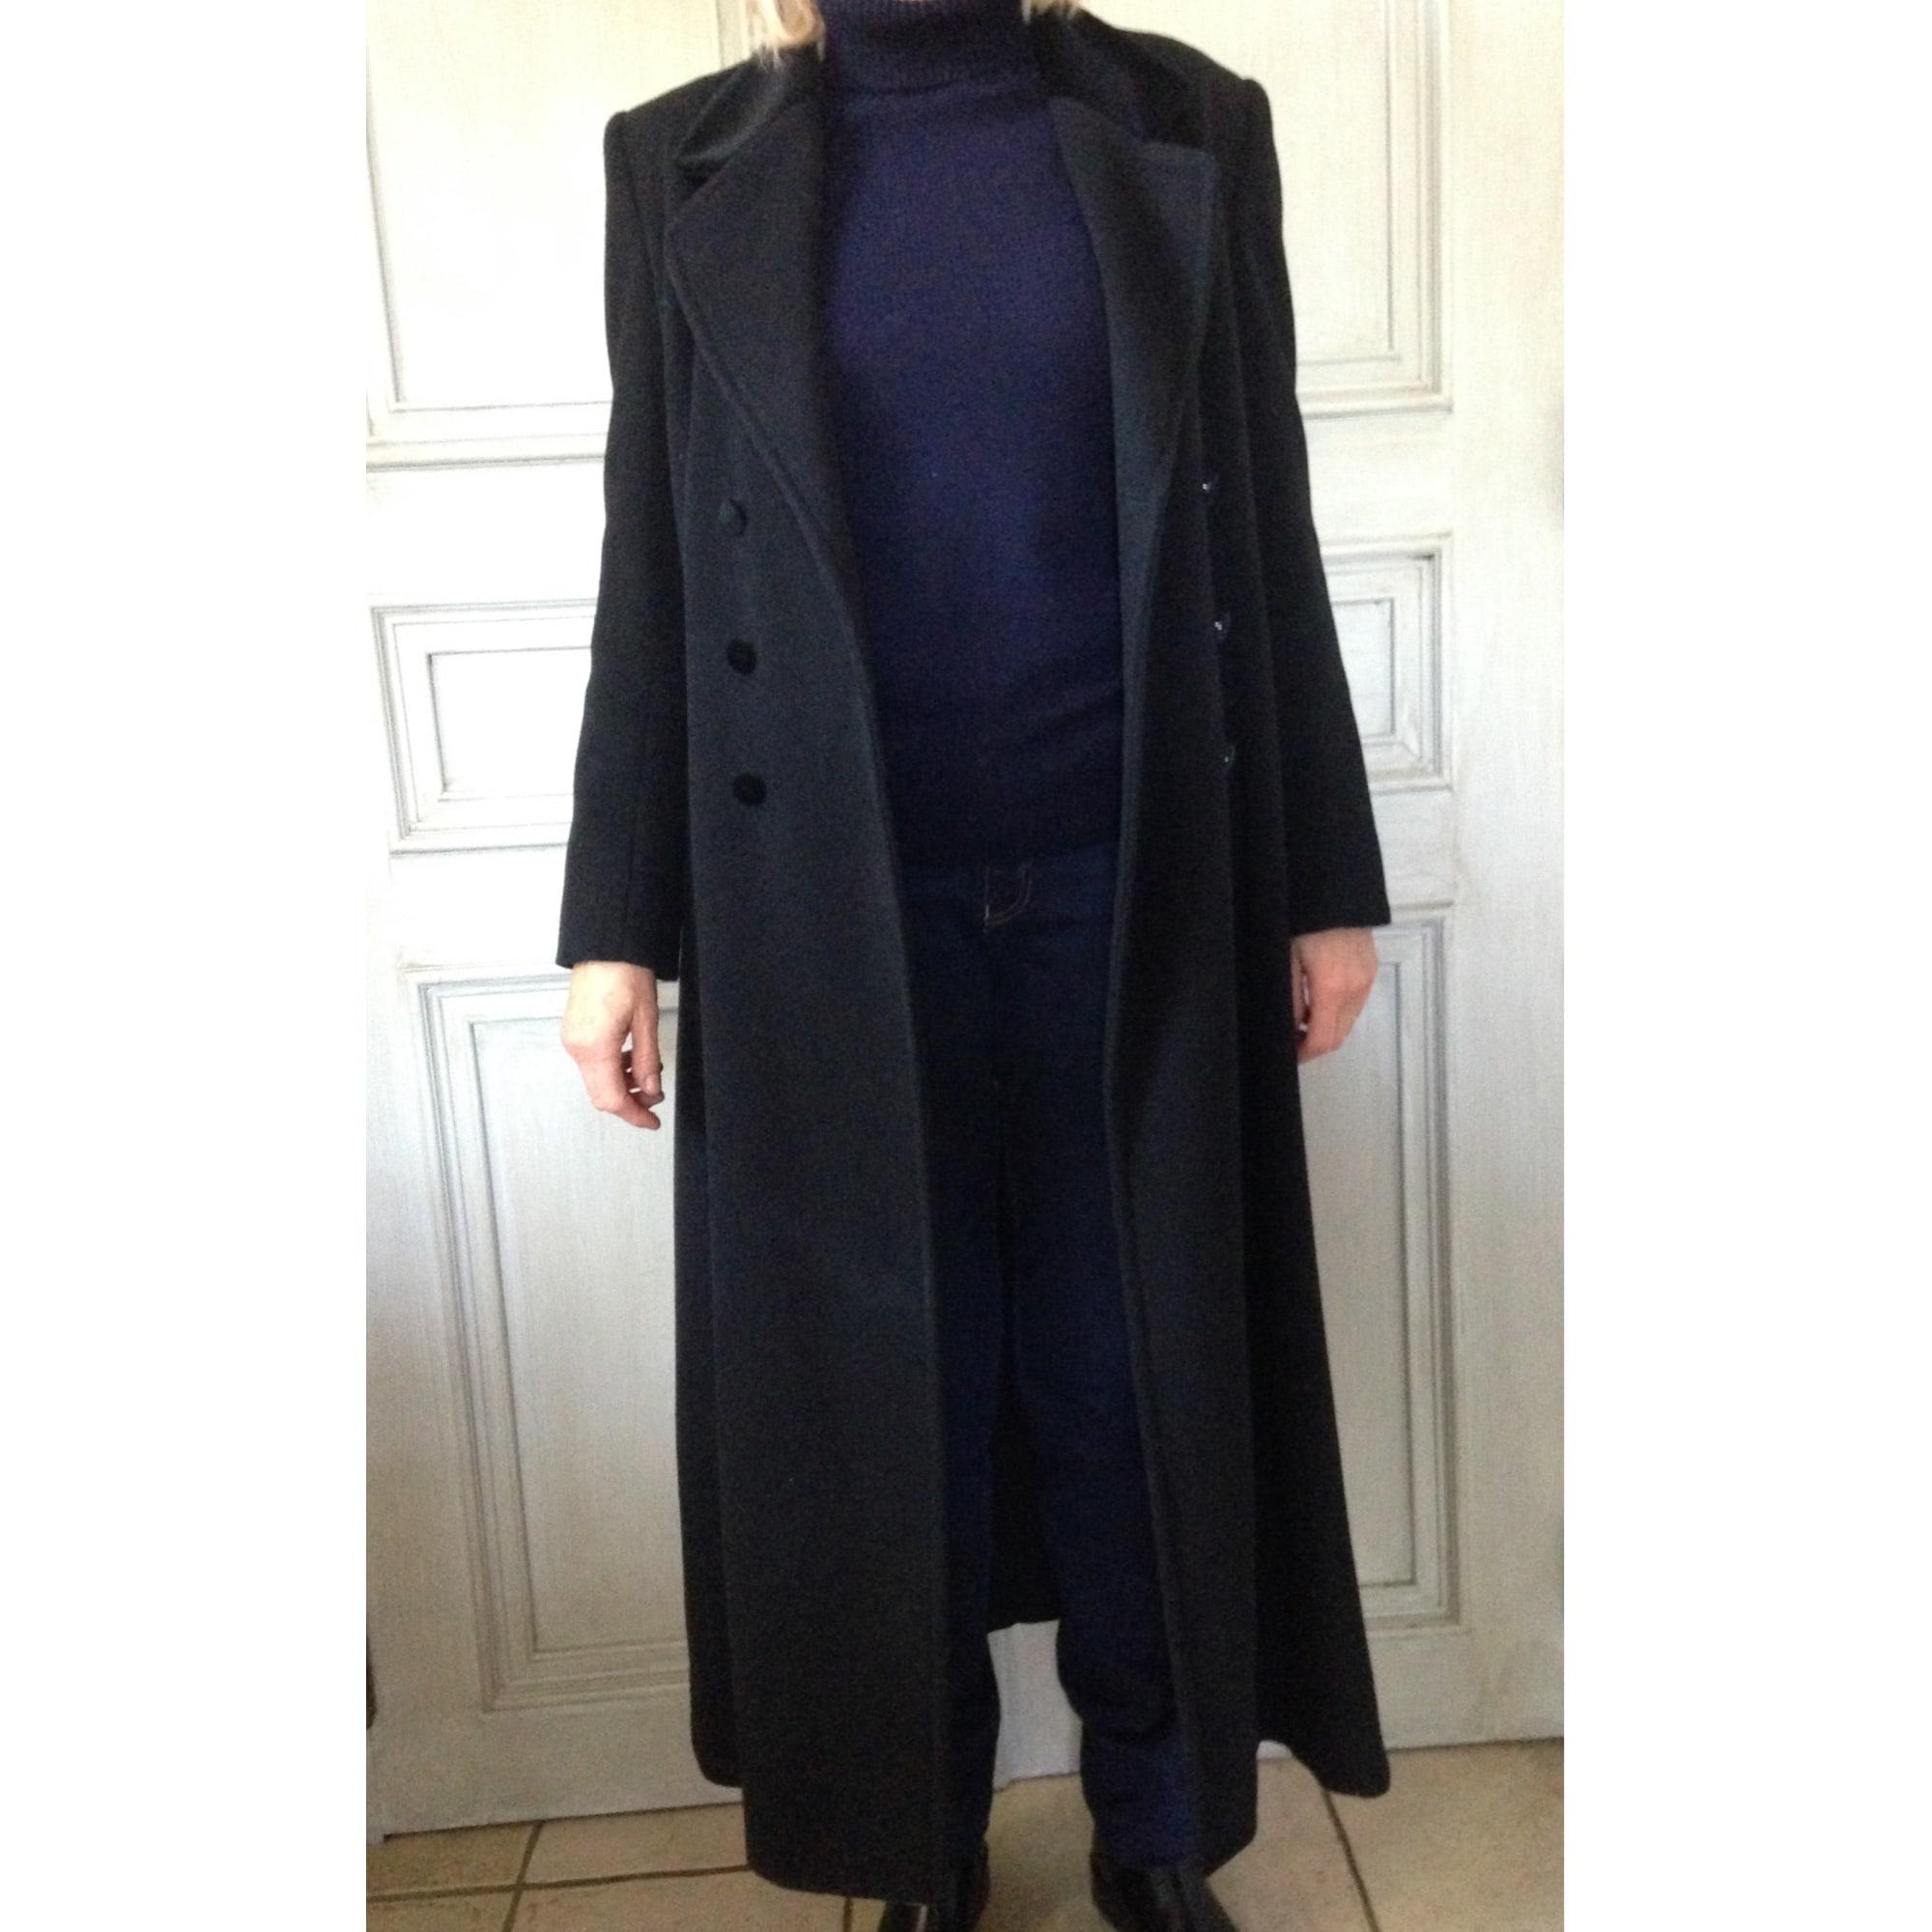 Manteau CAROLL 42 (L XL, T4) noir vendu par Dord - 4472321 94aef65f157